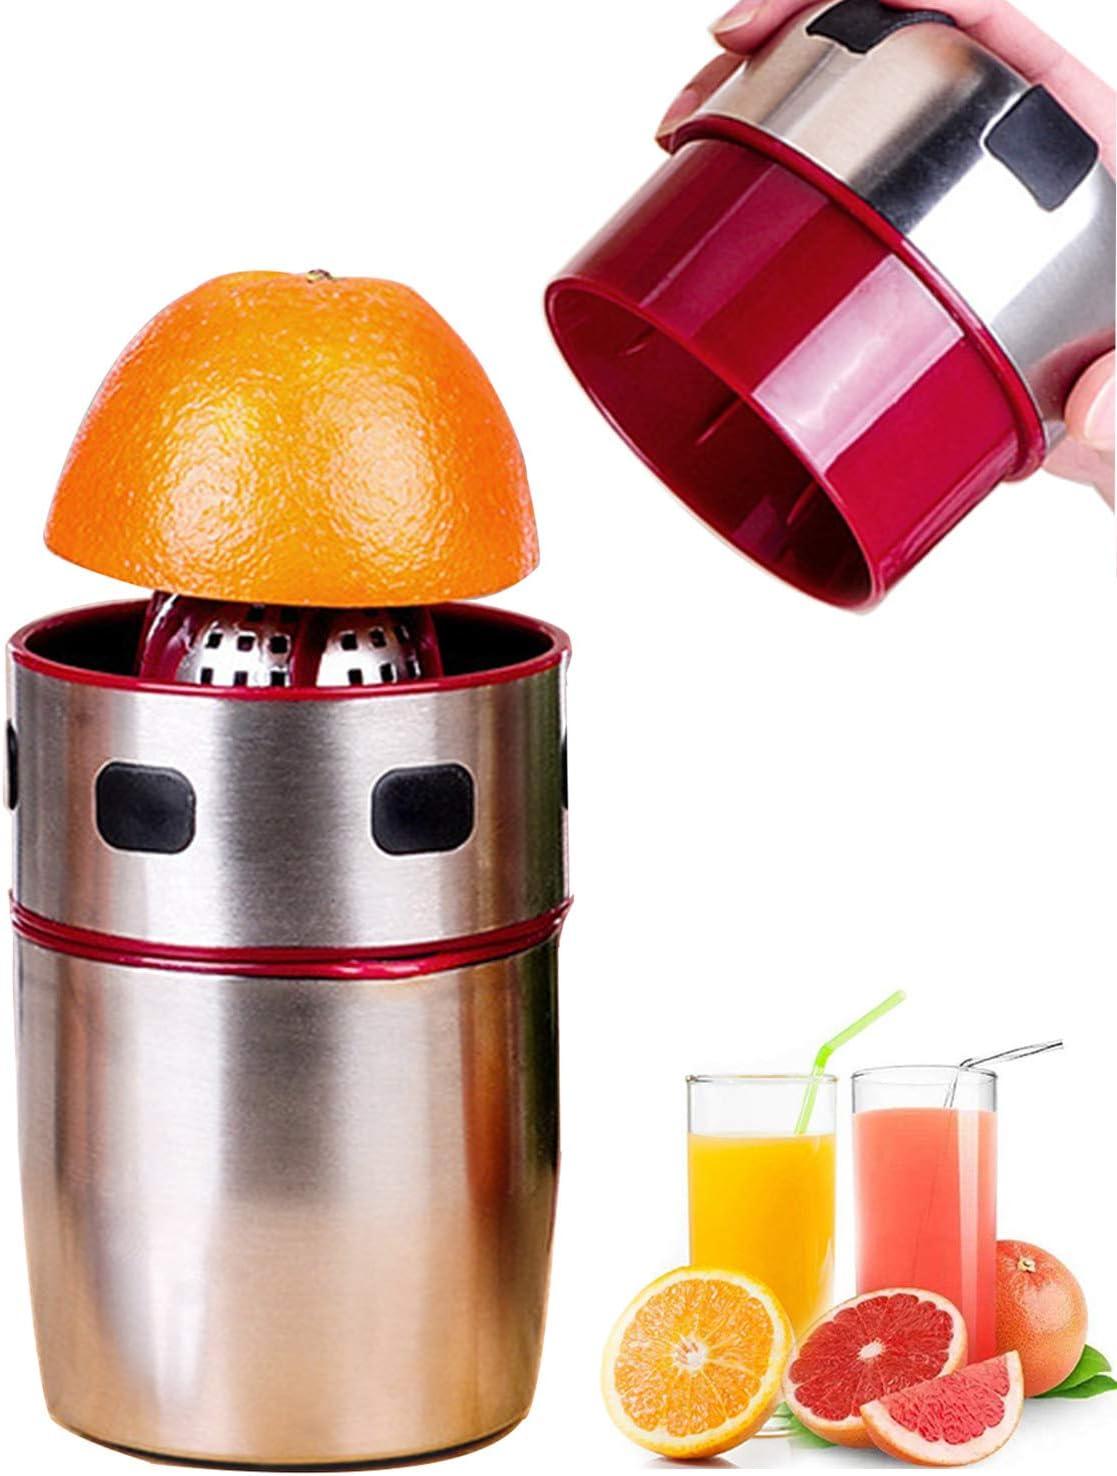 Citrus Juicer Stainless Steel Juicer Extractor Lemon Lime Orange Grapefuit Juice Fruit Squeezer Juicers Machine Include Filter,Red,1 Piece